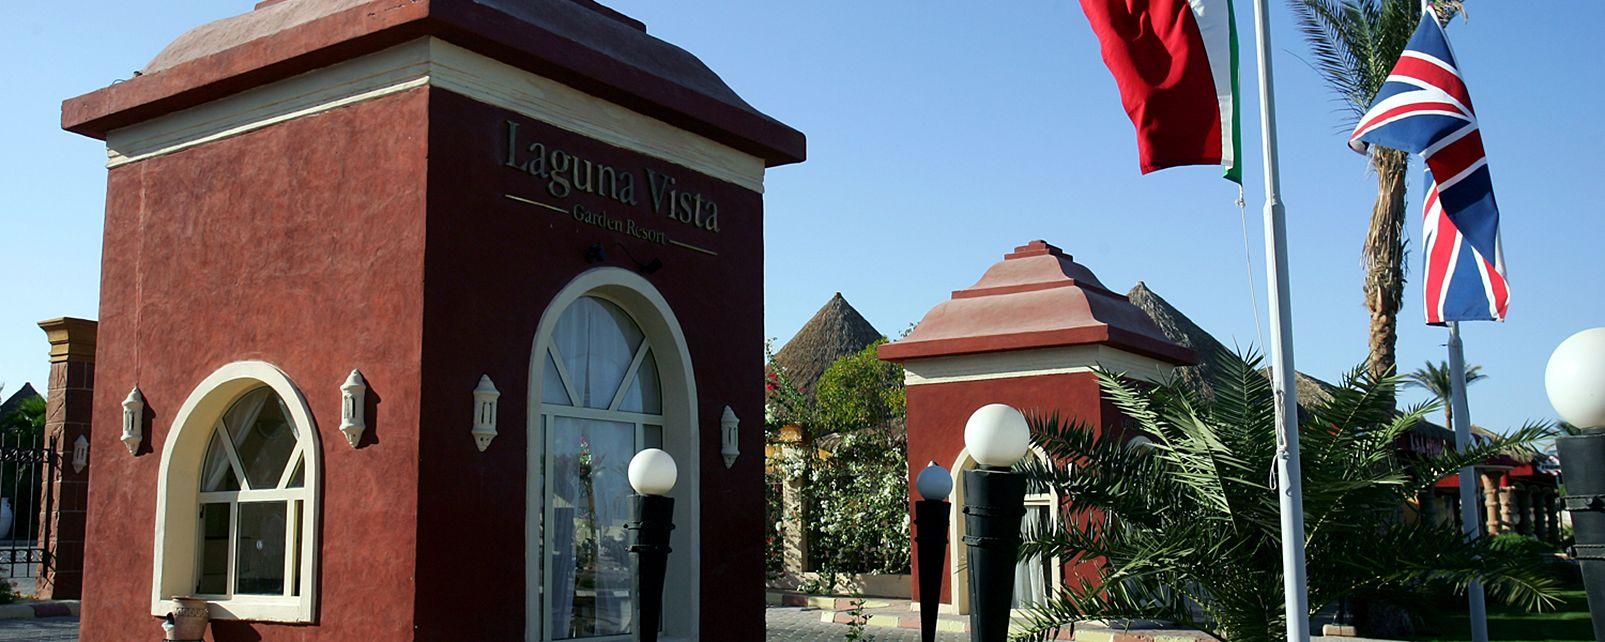 Hotel Laguna Vista Garden Resort